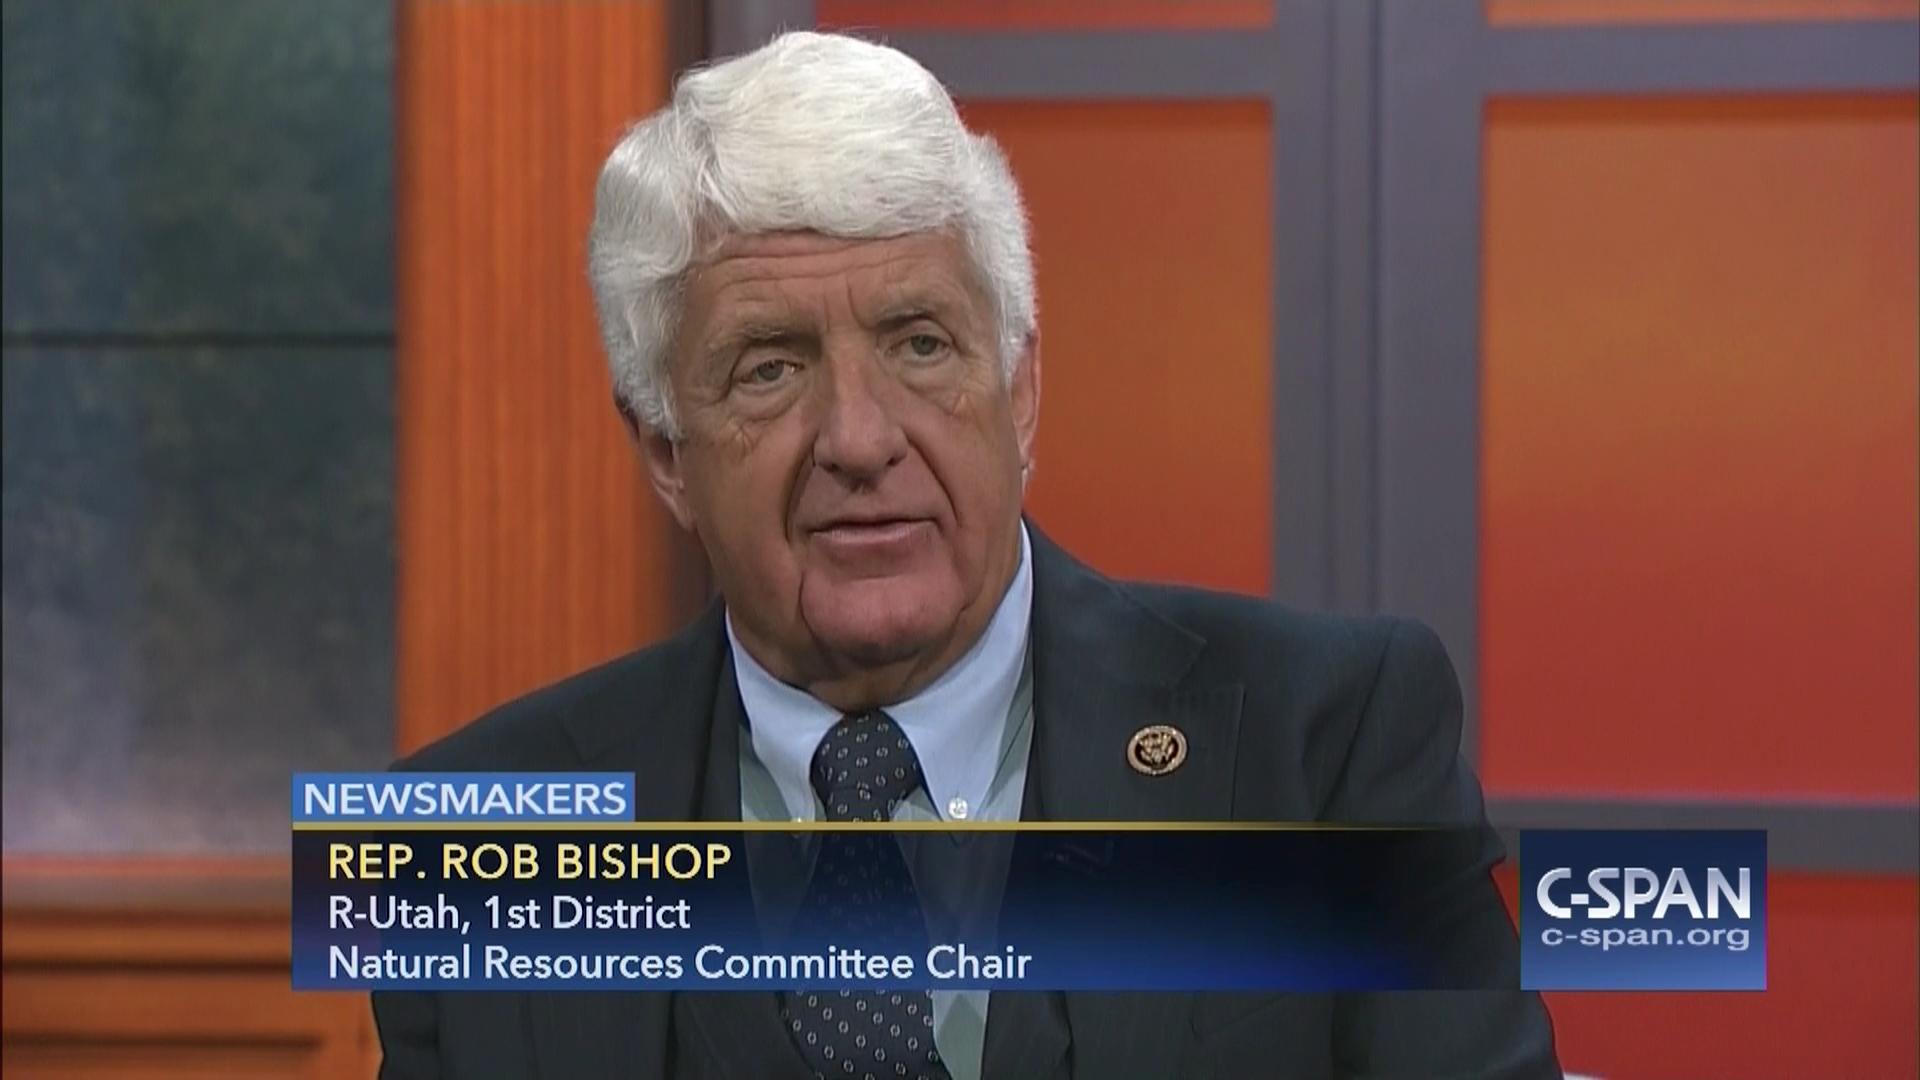 newsmakers representative rob bishop, may 13 2016   c-span